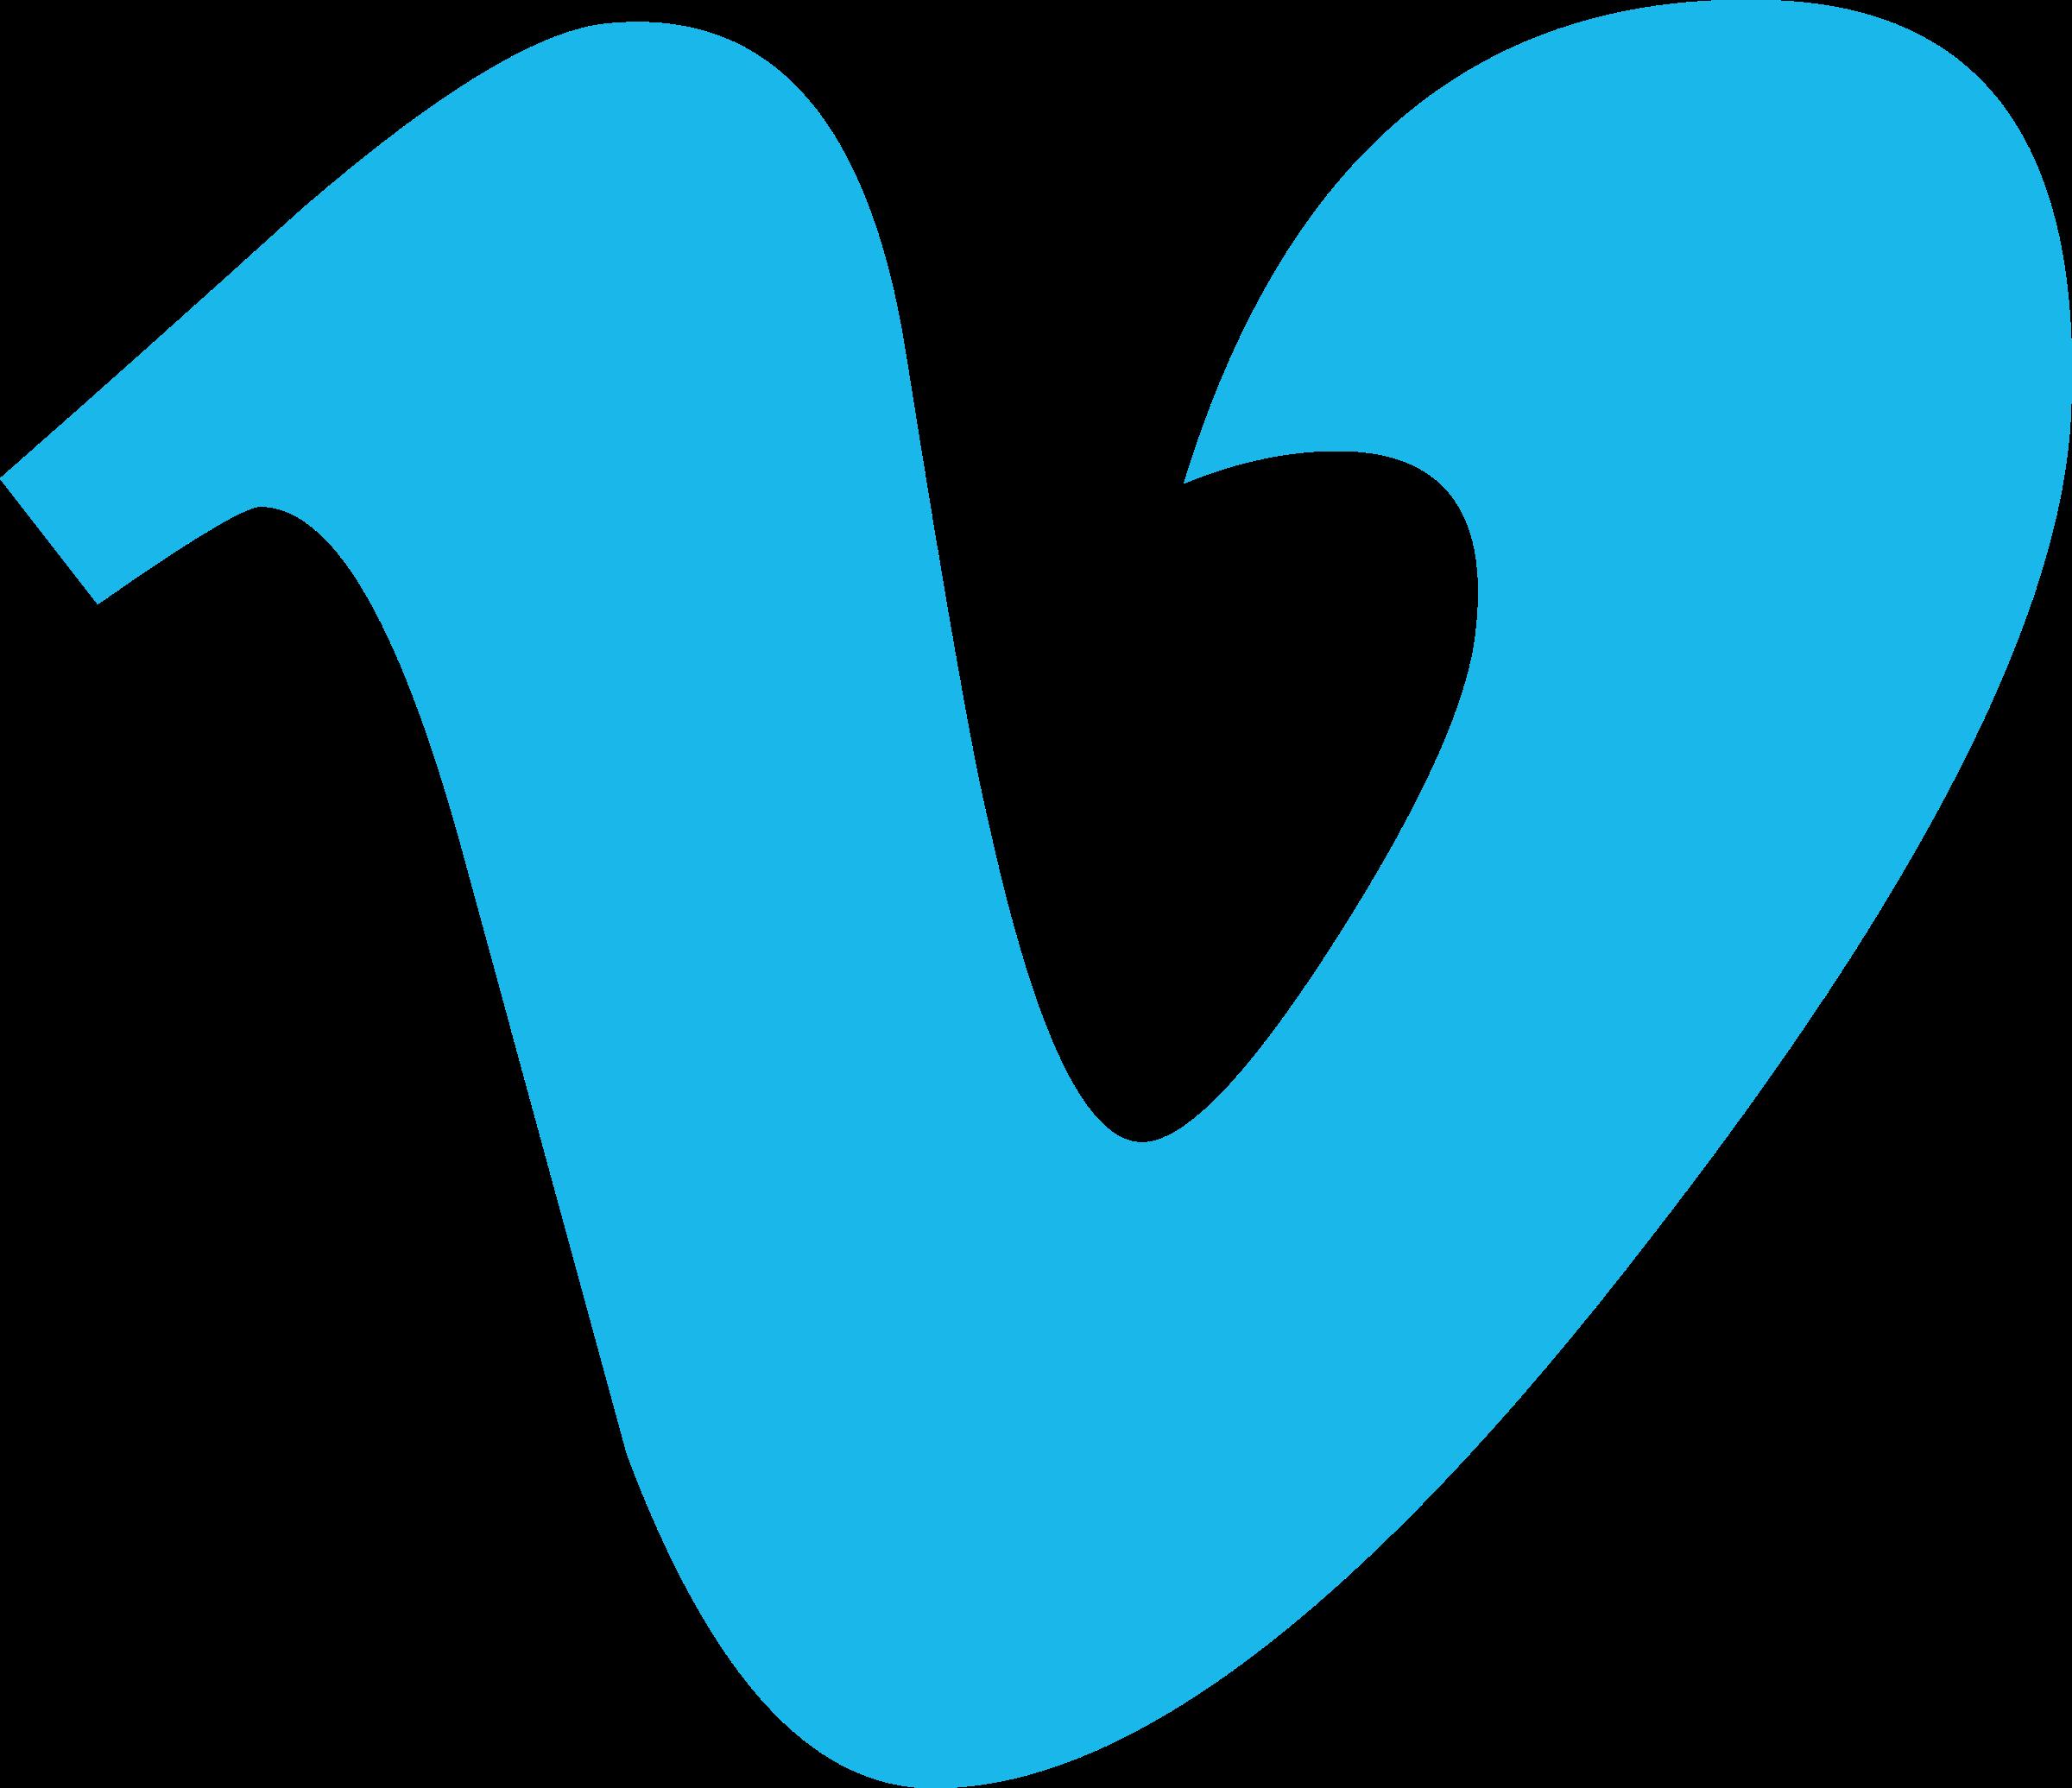 vimeo icon blue logo png transparent svg vector freebie supply rh freebiesupply com vimeo logo vectoriel vimeo logo vector download